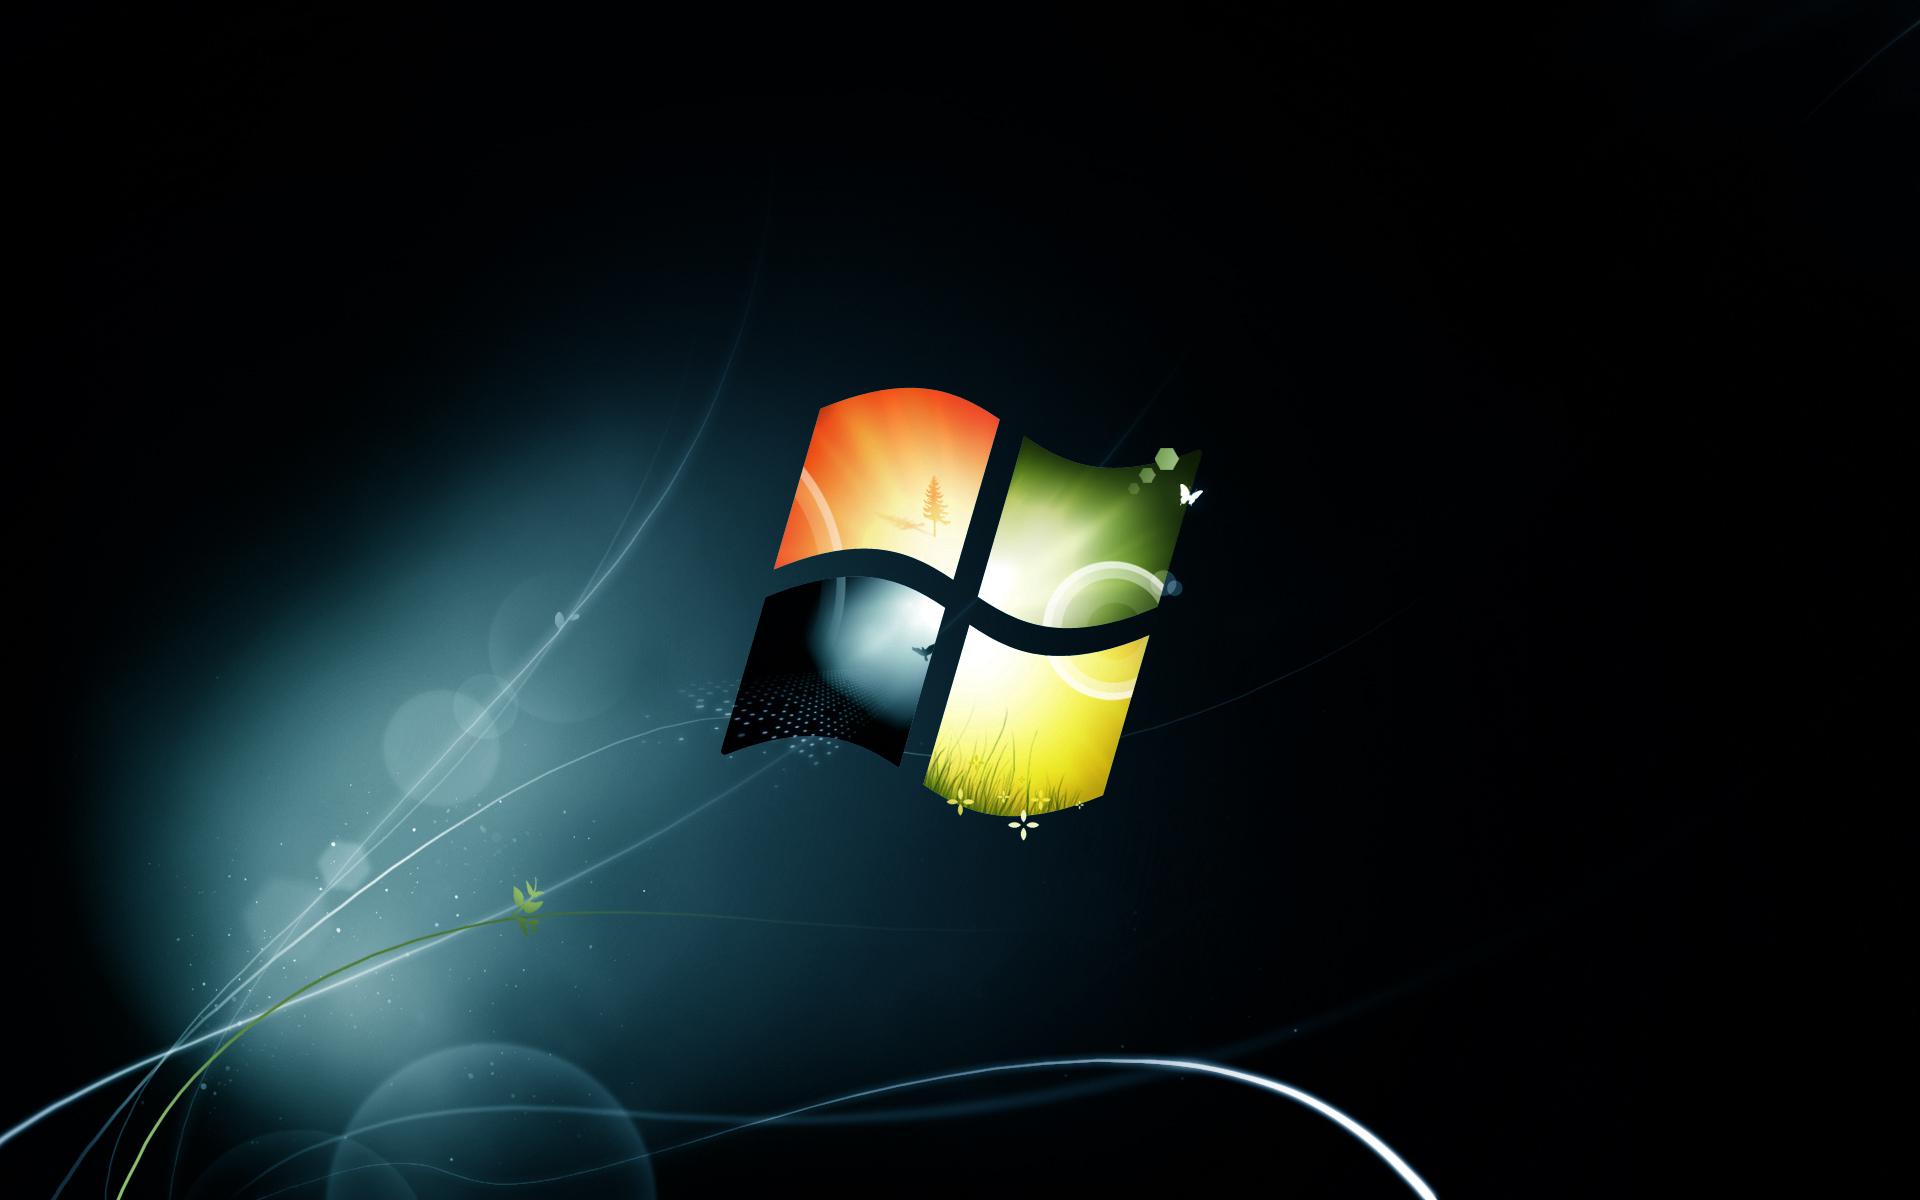 Windows 7 Black Wallpaper ImageBankbiz 1920x1200